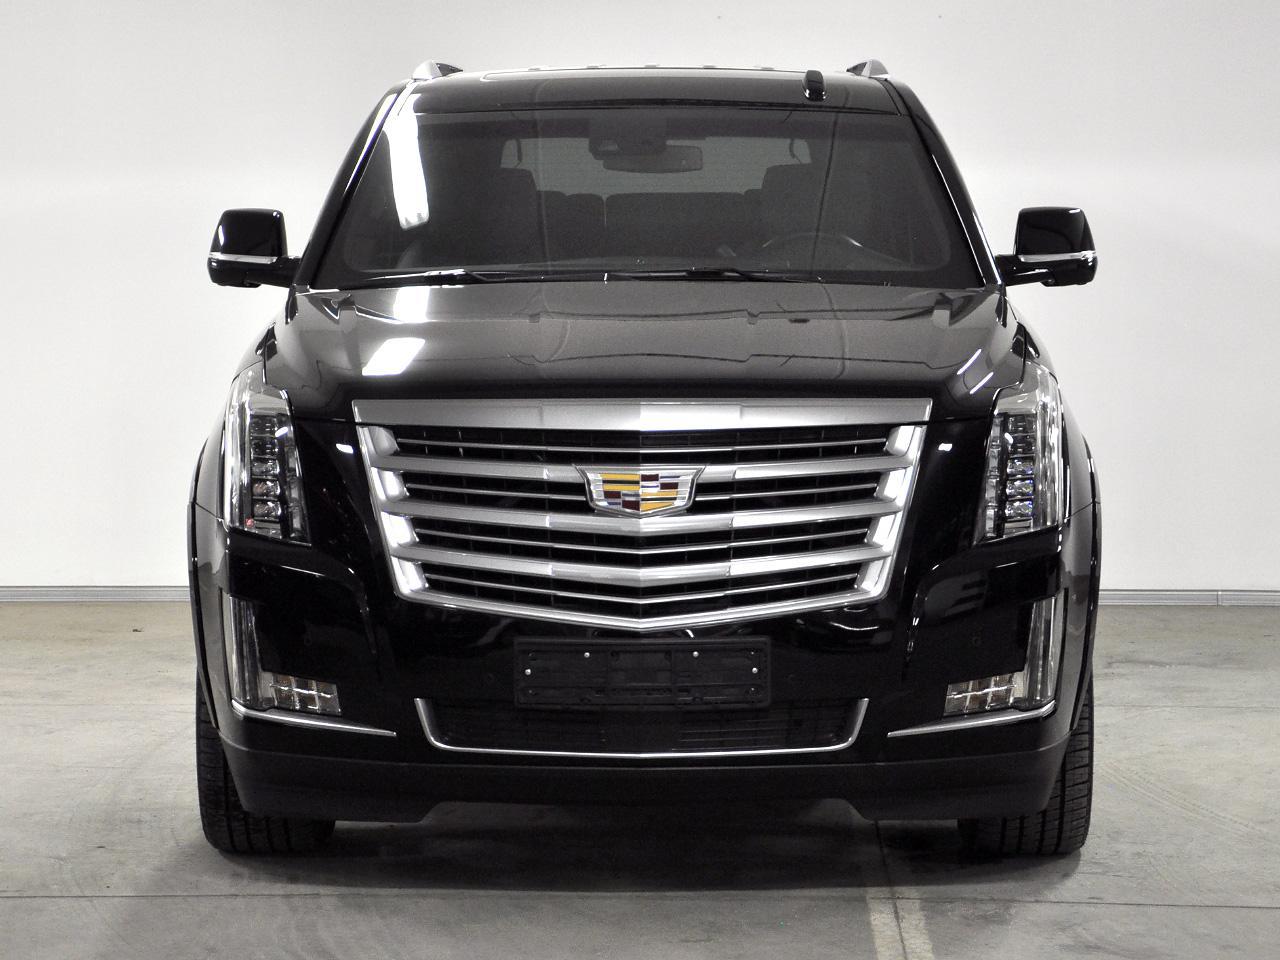 Cadillac Escalade 6.2 V8 АТ 4WD (409 л. с.) Platinum